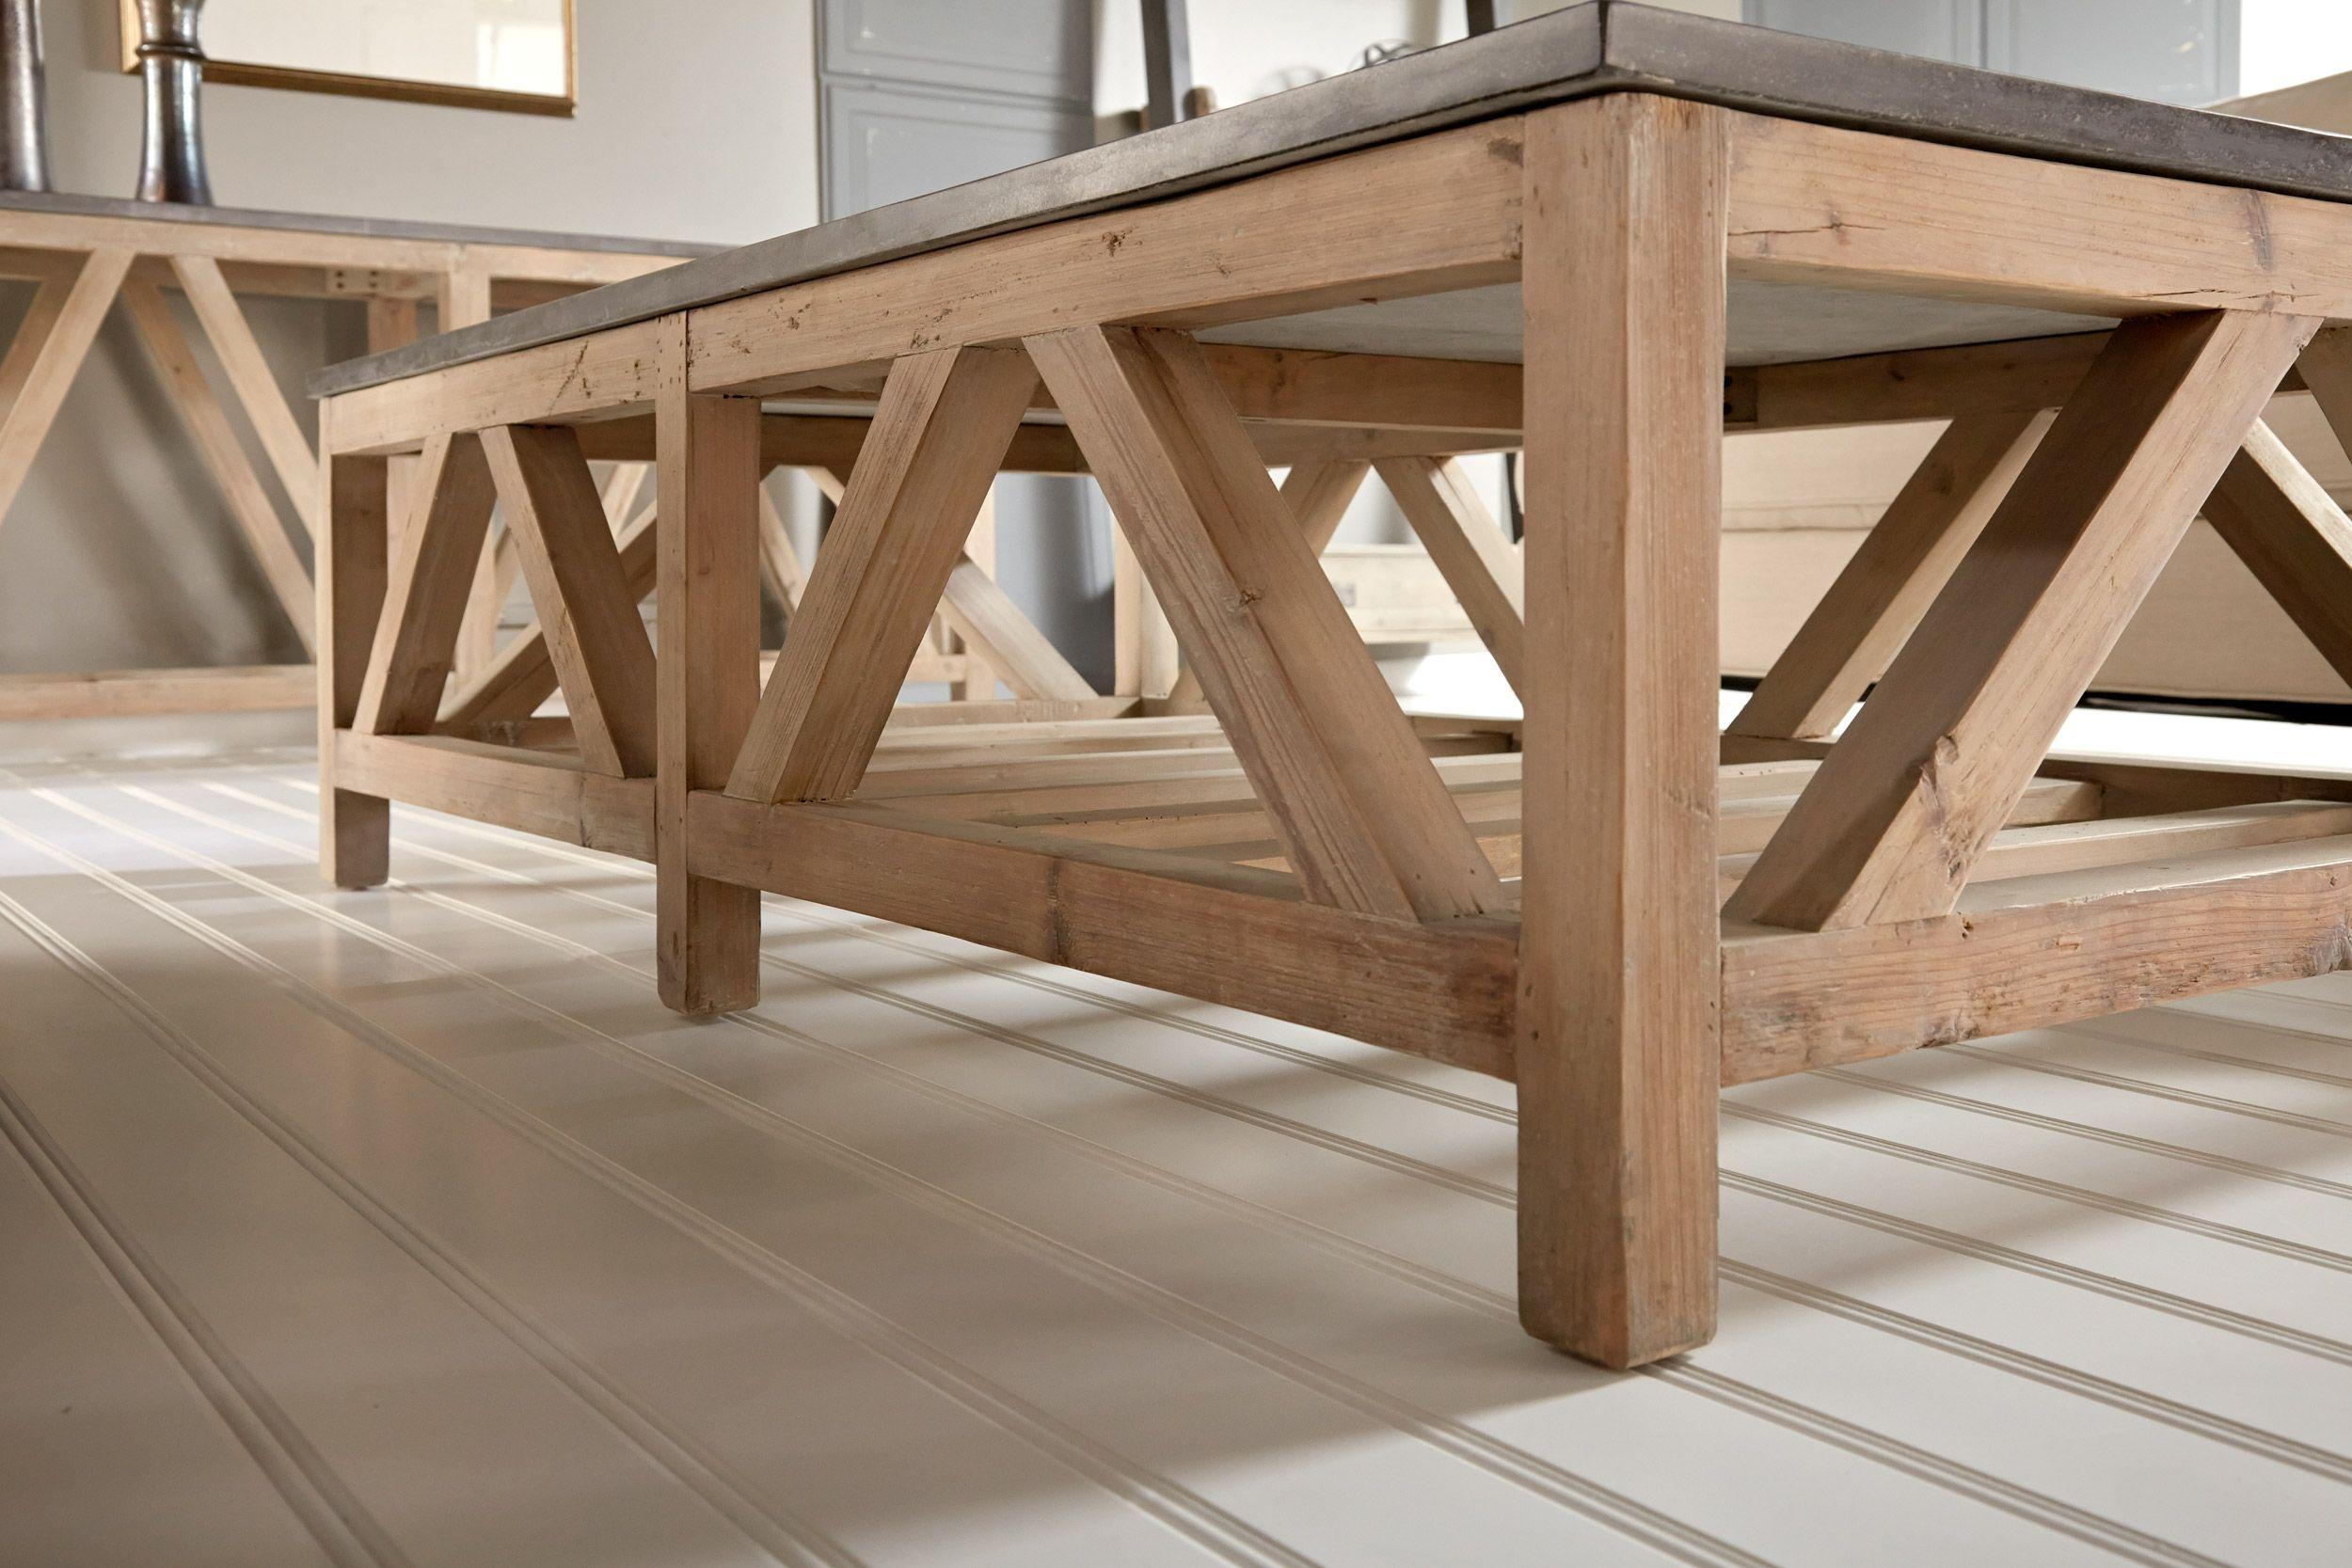 bluestone coffee table. Blue Stone Coffee Table From Tiffany\u0027s Home Design Bluestone Y